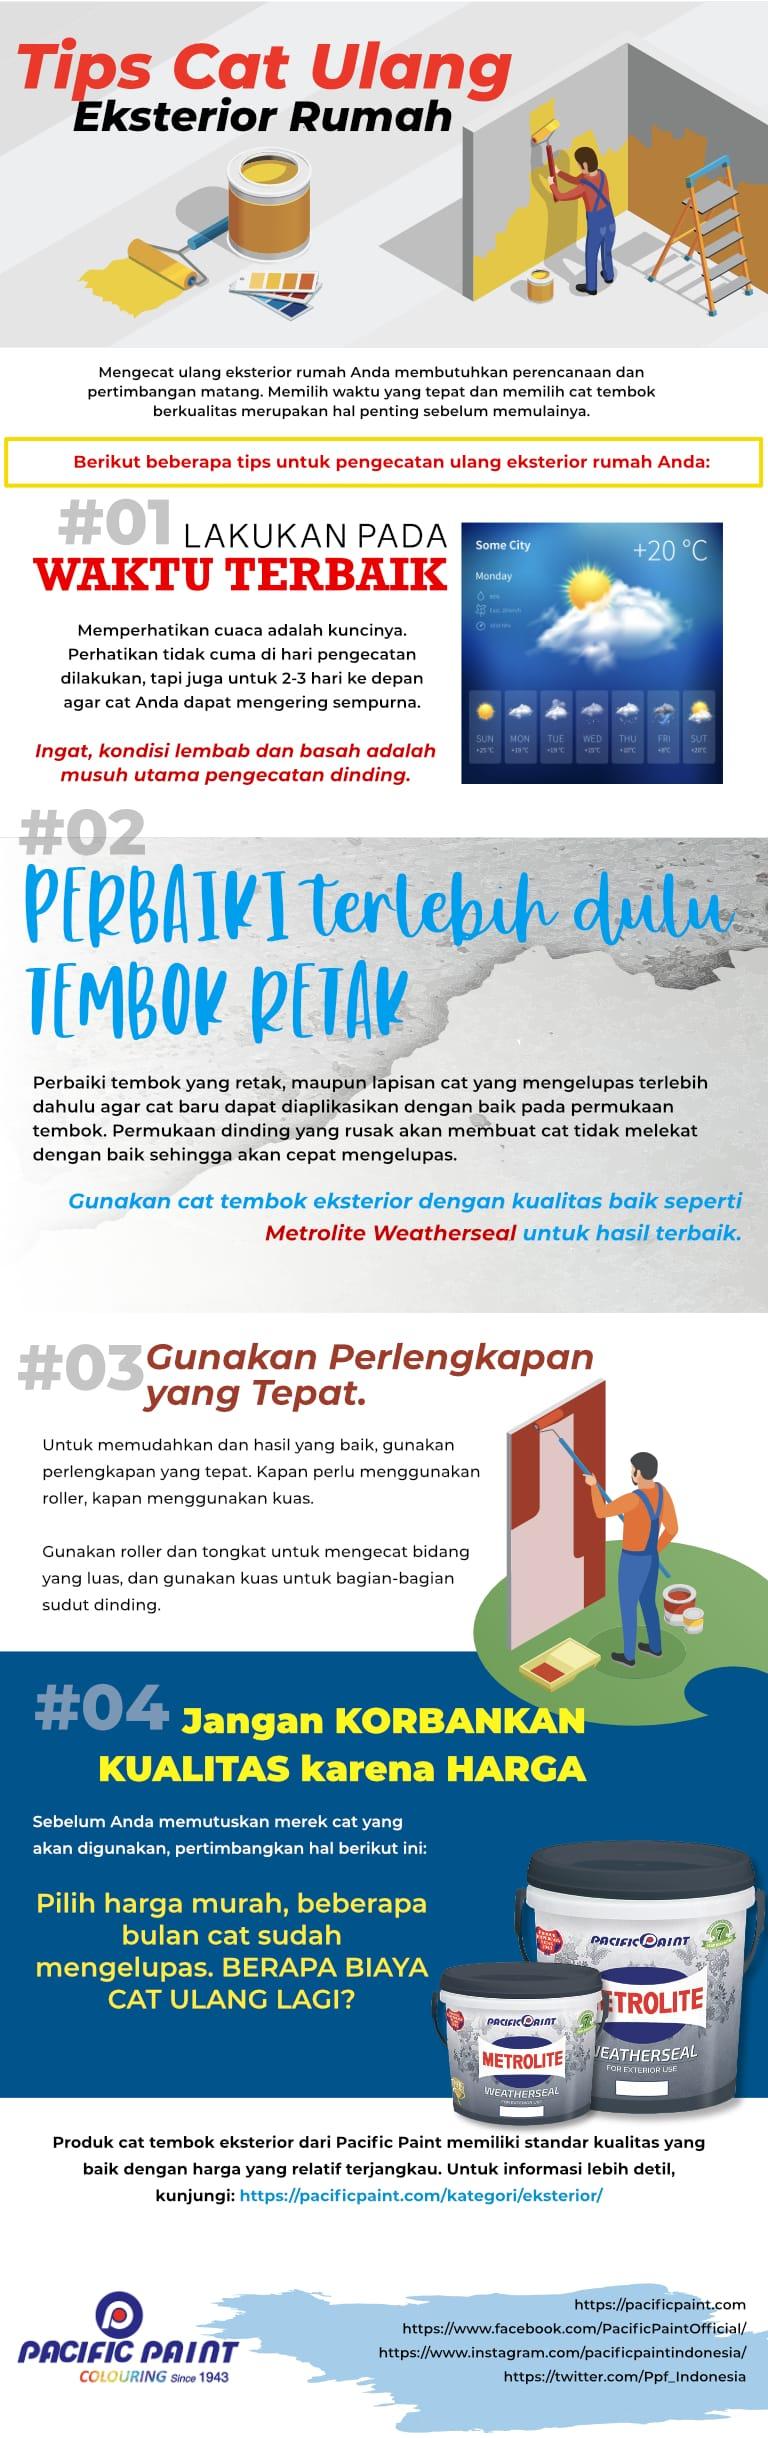 infographic Cat Ulang Eksterior